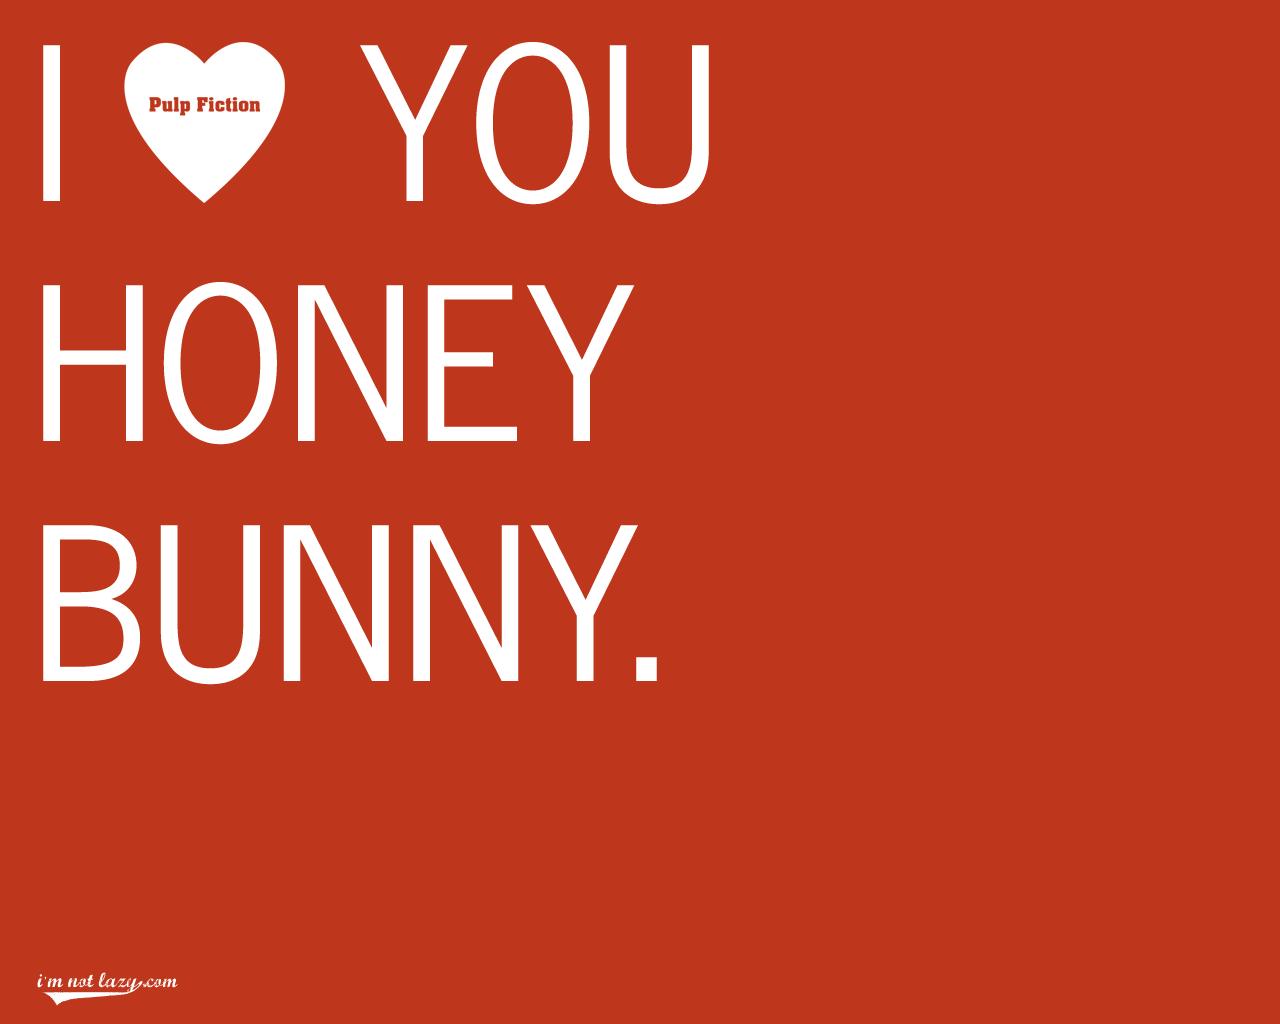 Wallpaper I Love You Honey : I LOVE YOU HONEY BUNNY. by imnotlazy on DeviantArt